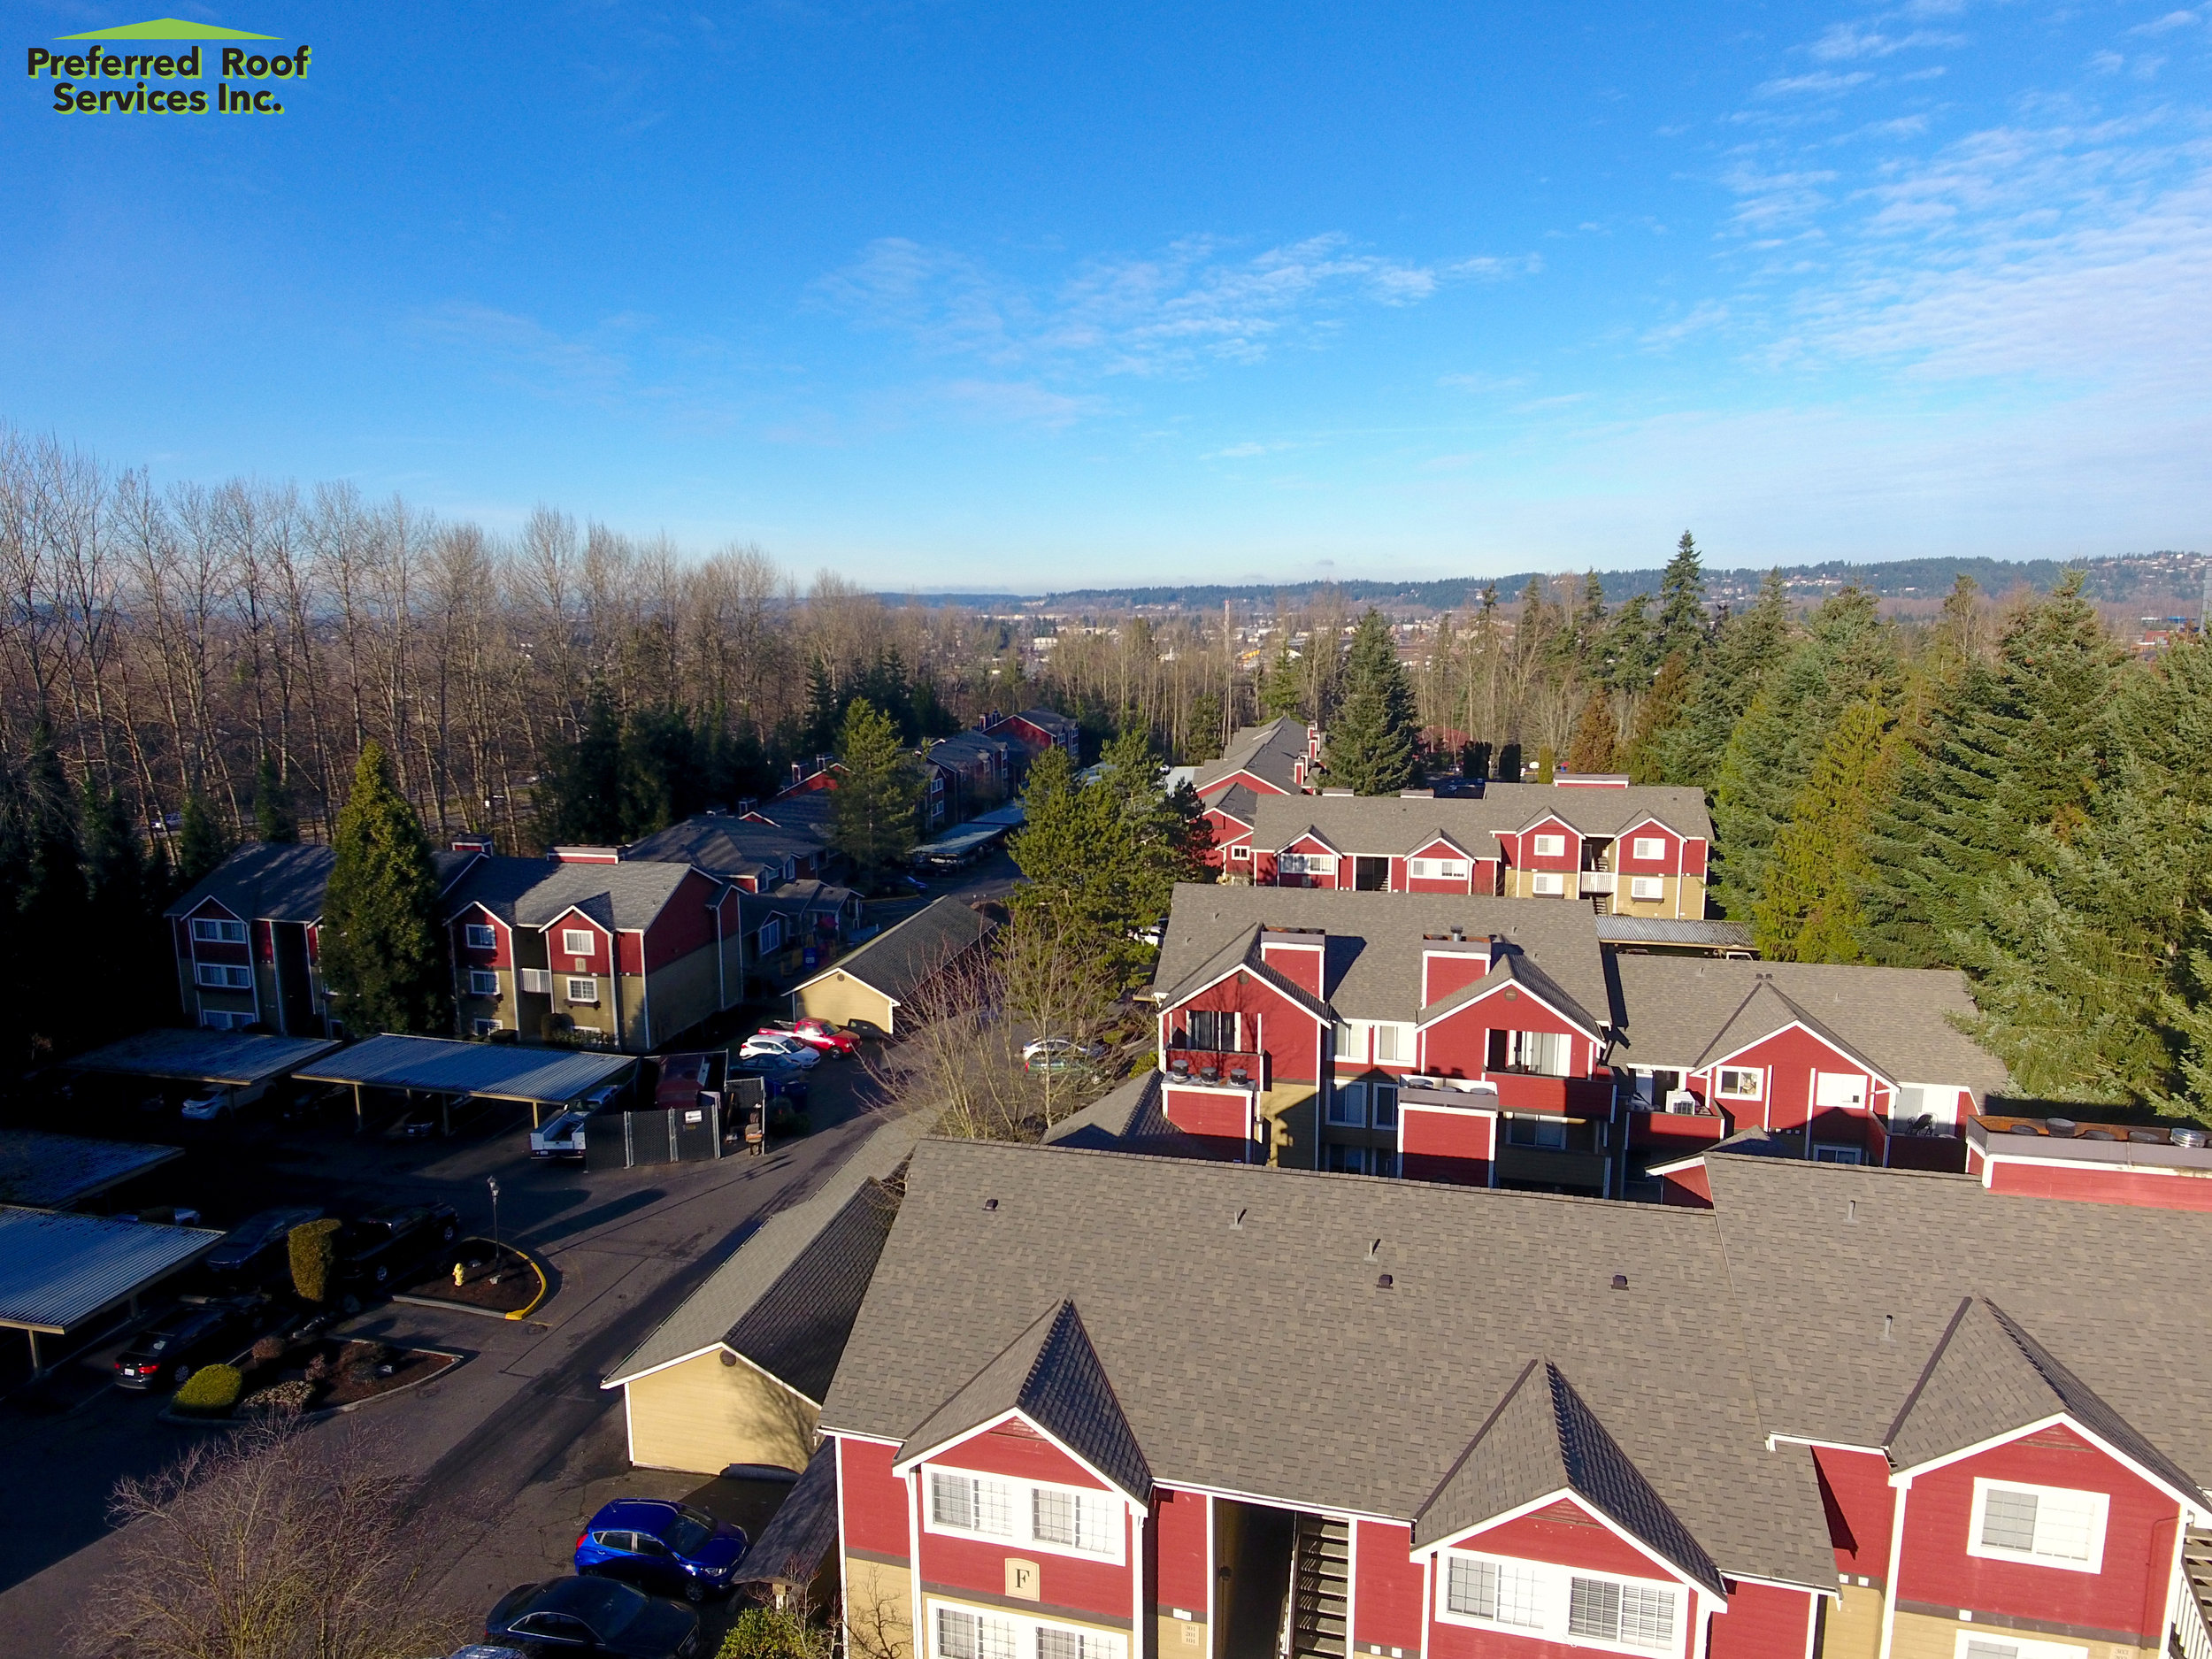 Chestnut Hill Apartments- Steep Slope Asphalt Shingle Reroof, Puyallup, Washington